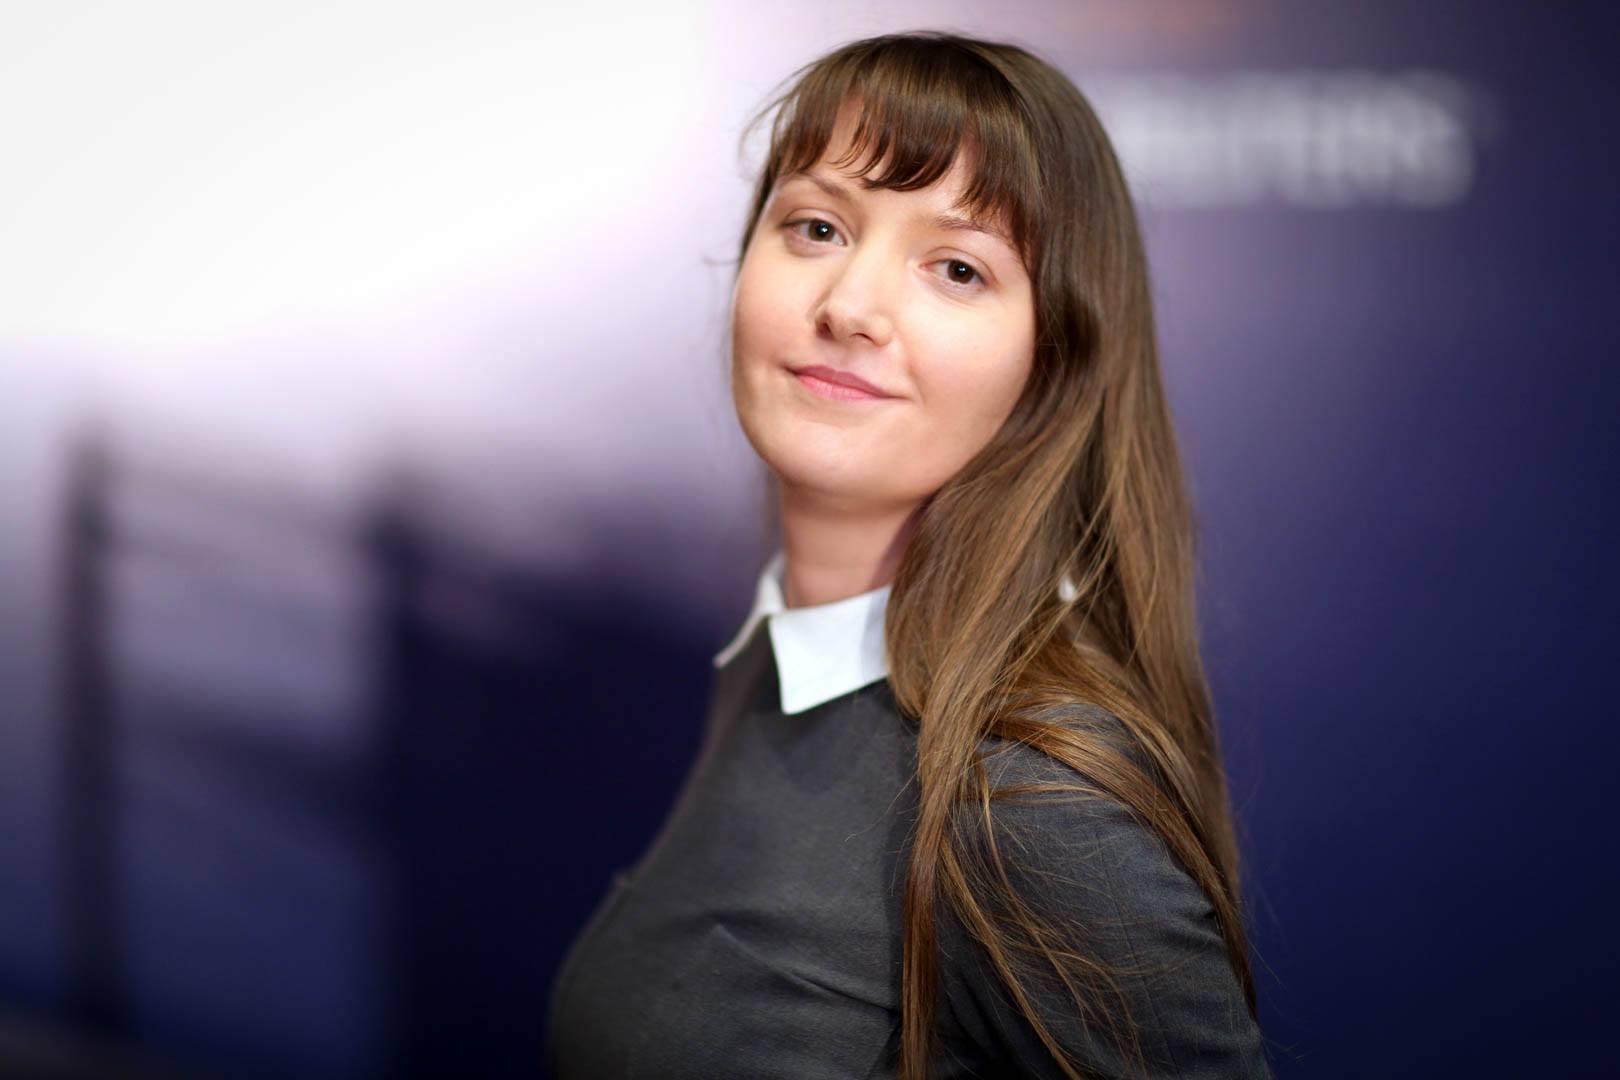 Инна Звягинцева, студентка MBA-программы WU Executive School